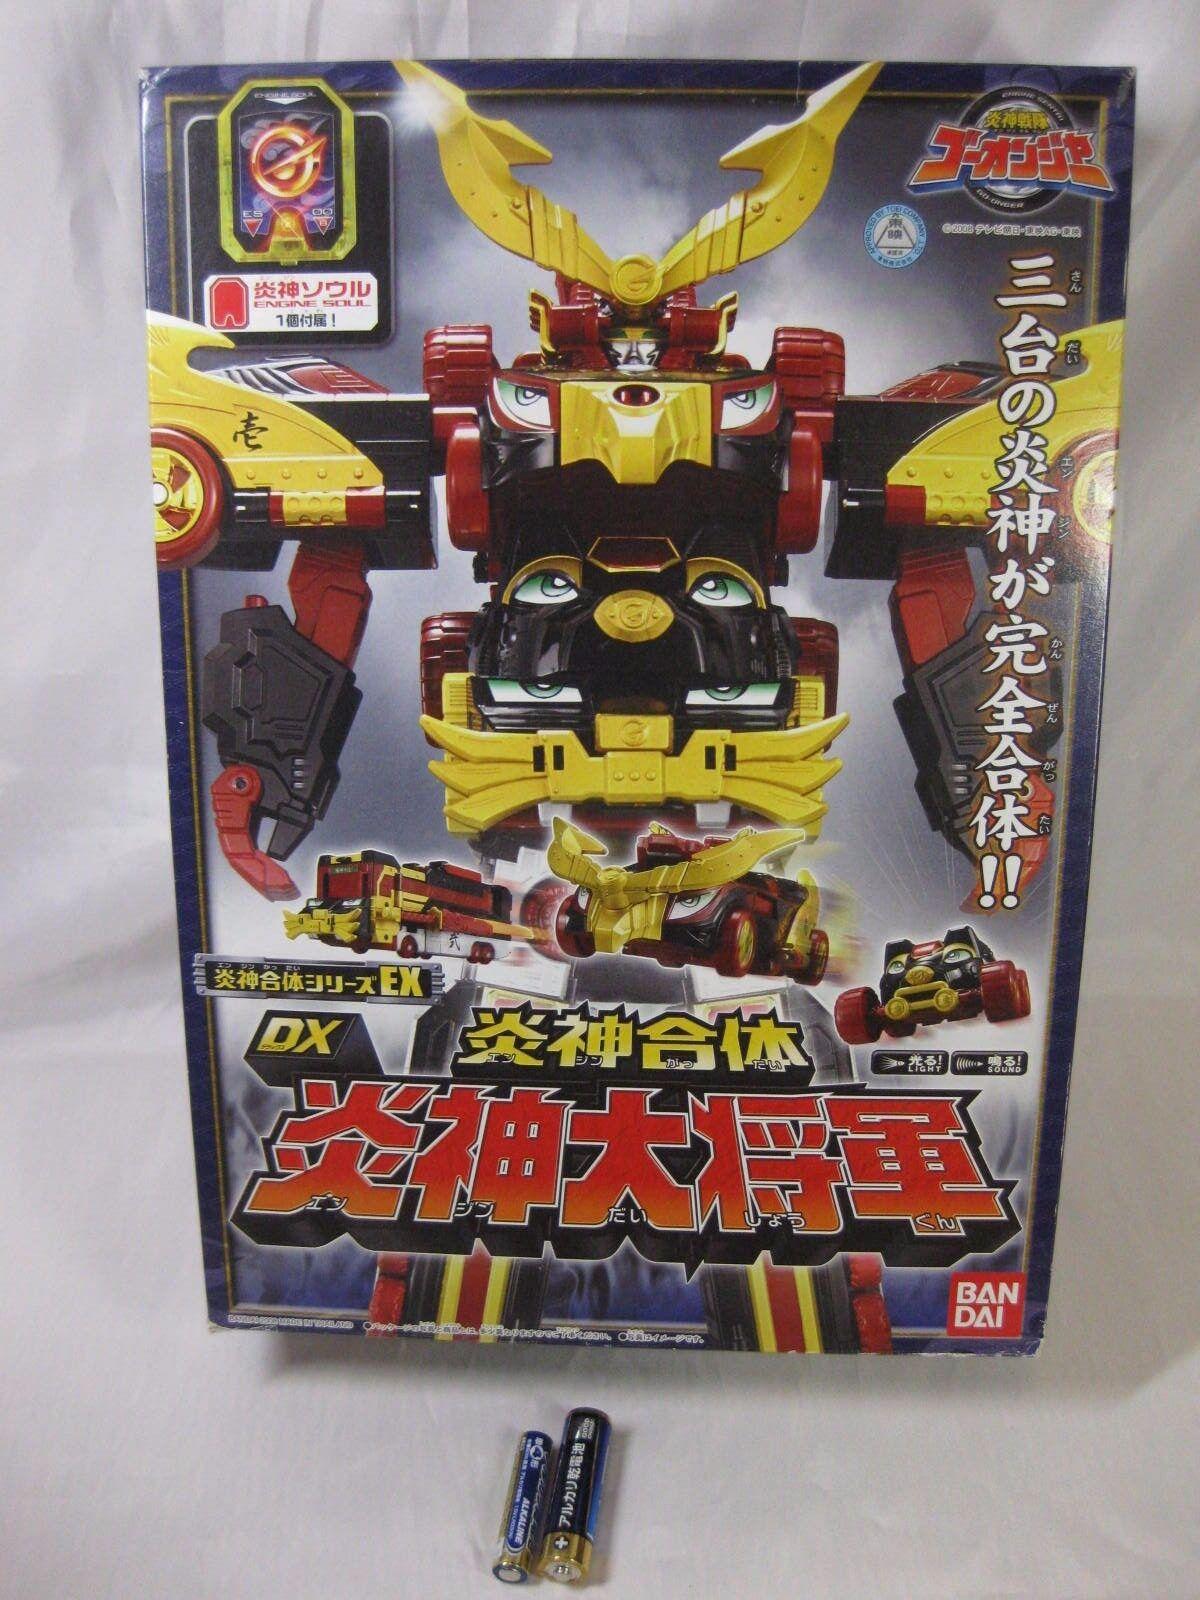 Power Power Power Ranger RPM Engine Sentai Go-Onger DX ENGIN-DAISHOGUN Megazord japan rare 5b7b6b